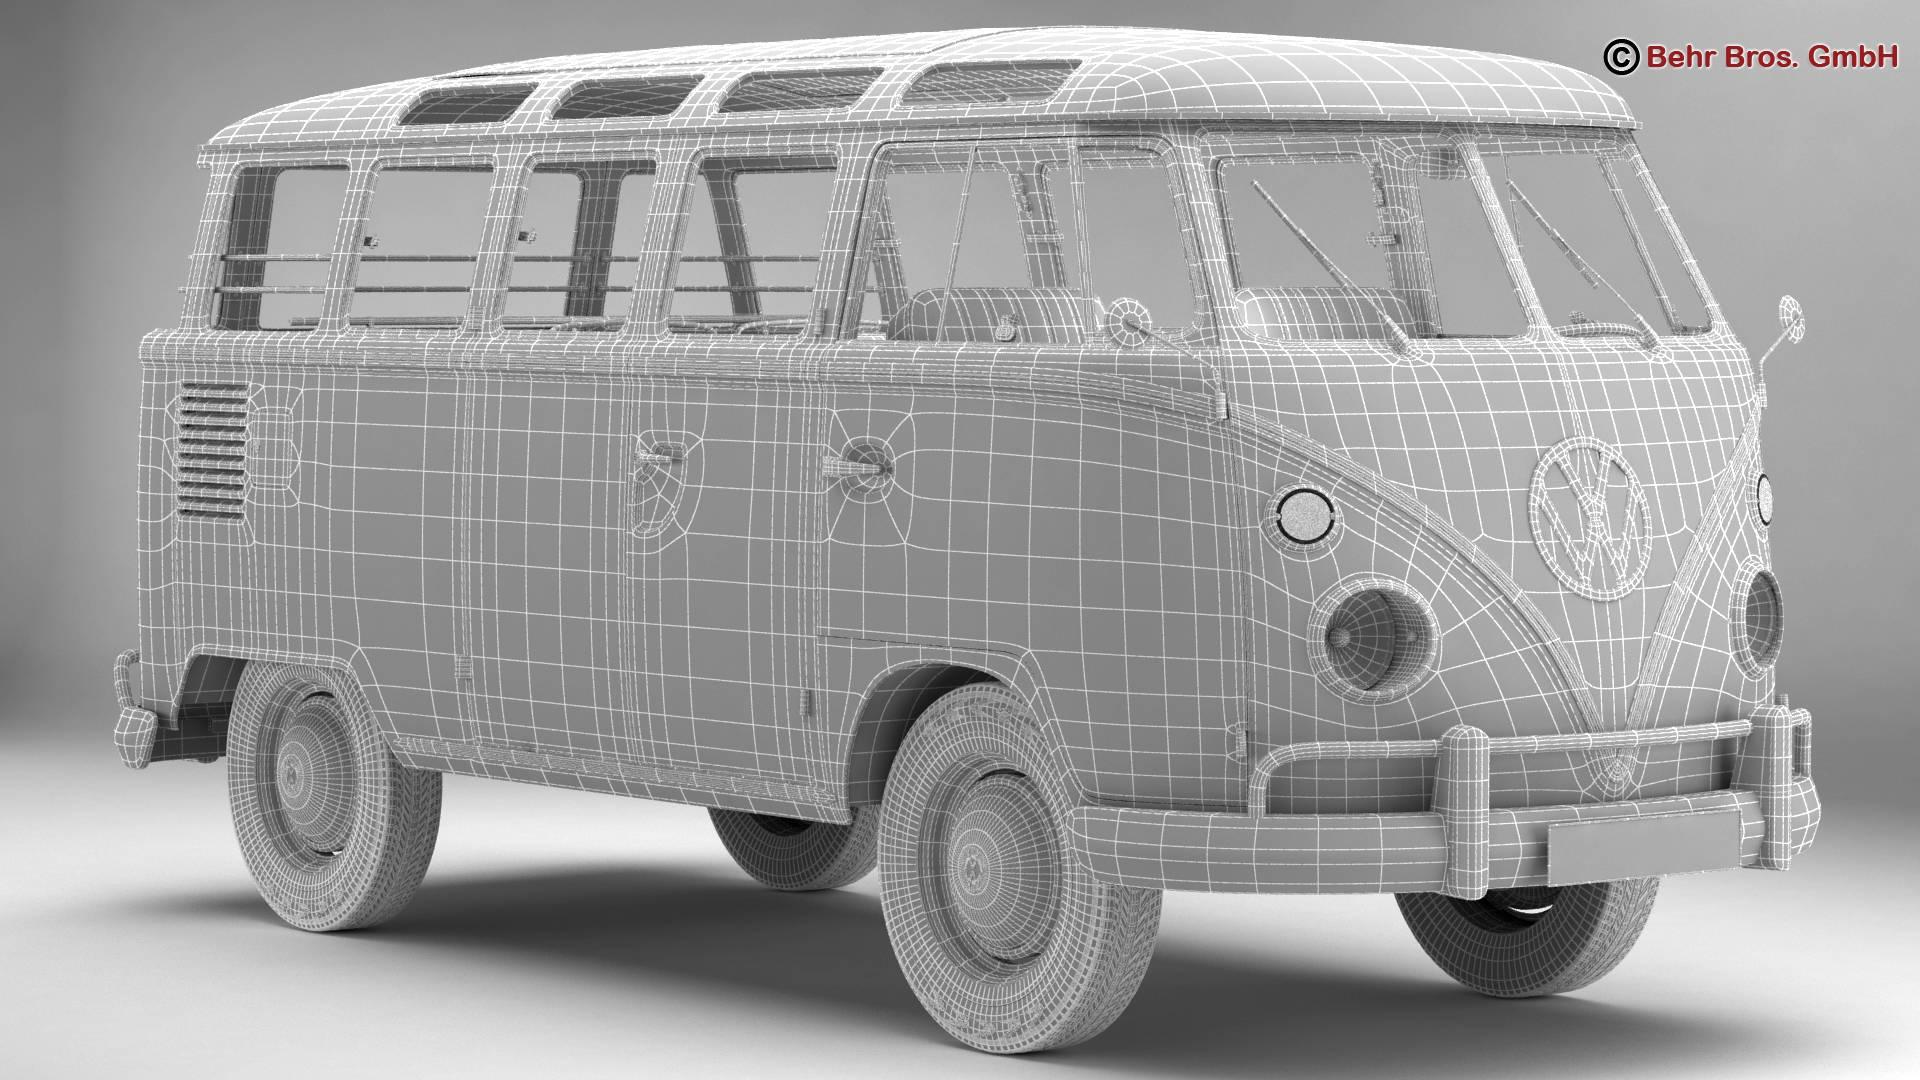 volkswagen type 2 samba 1963 hippie 3d model 3ds max fbx c4d lwo ma mb obj 217258